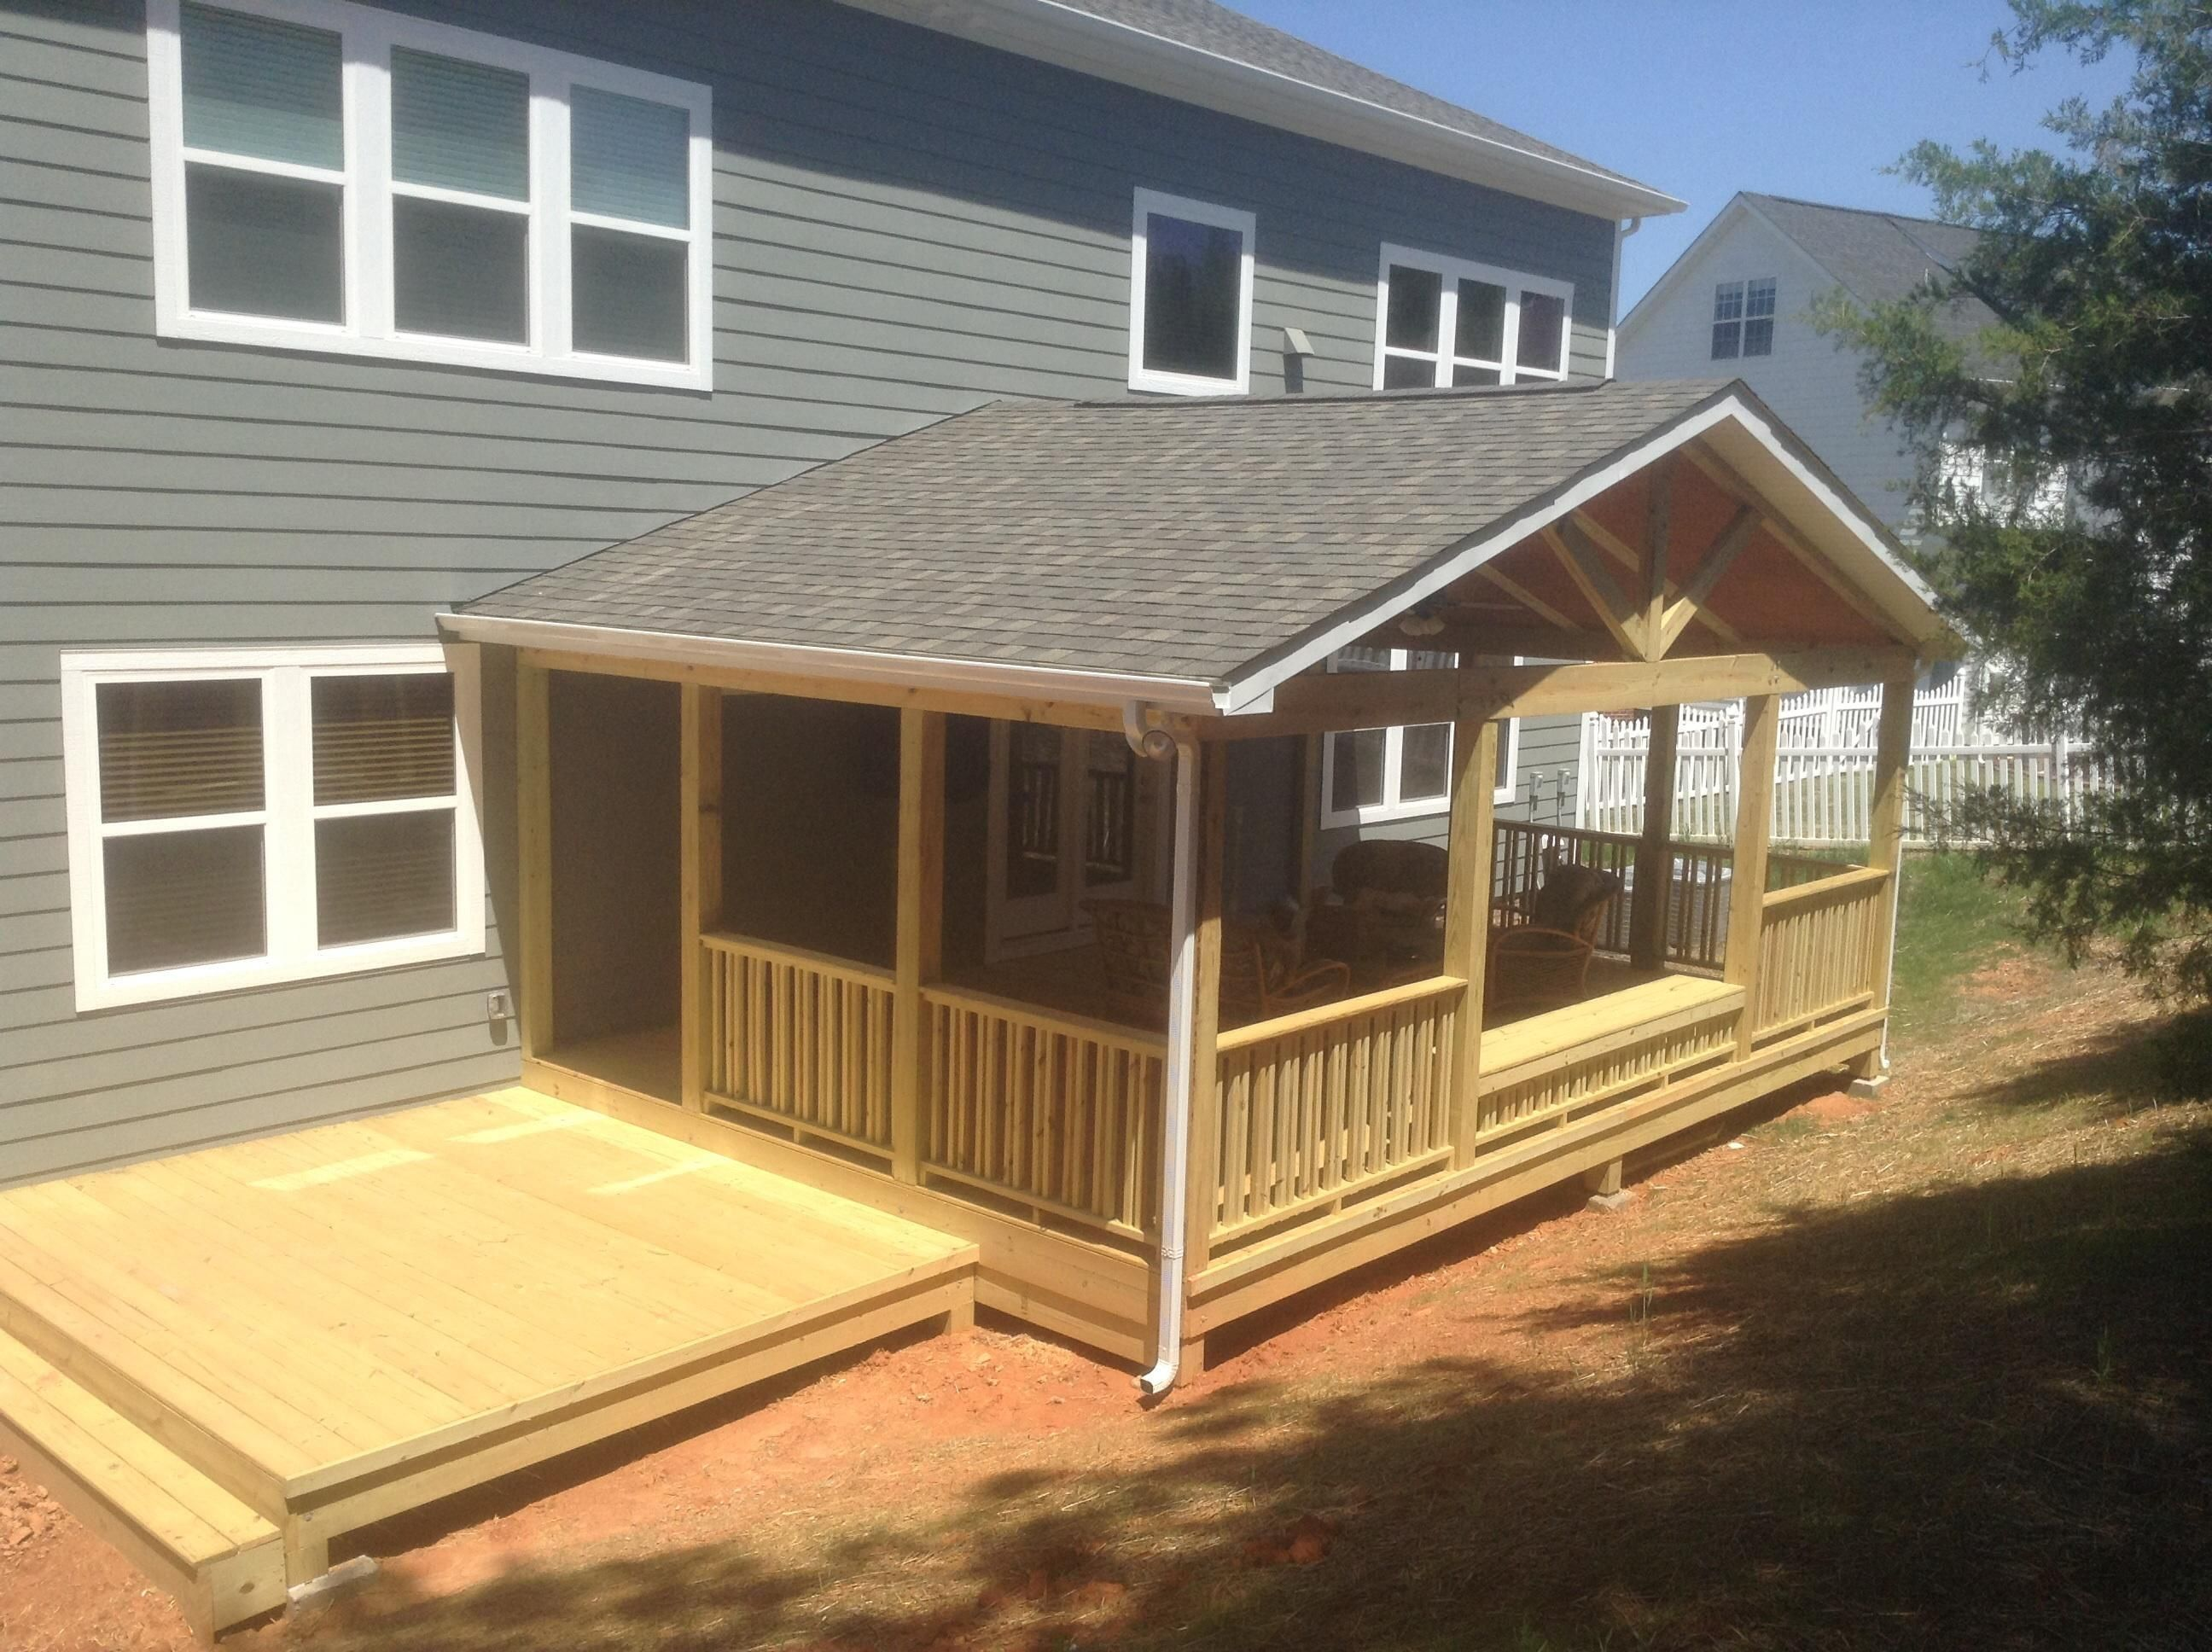 New Page 1 Small Backyard Decks Deck Designs Backyard Patio Deck Designs